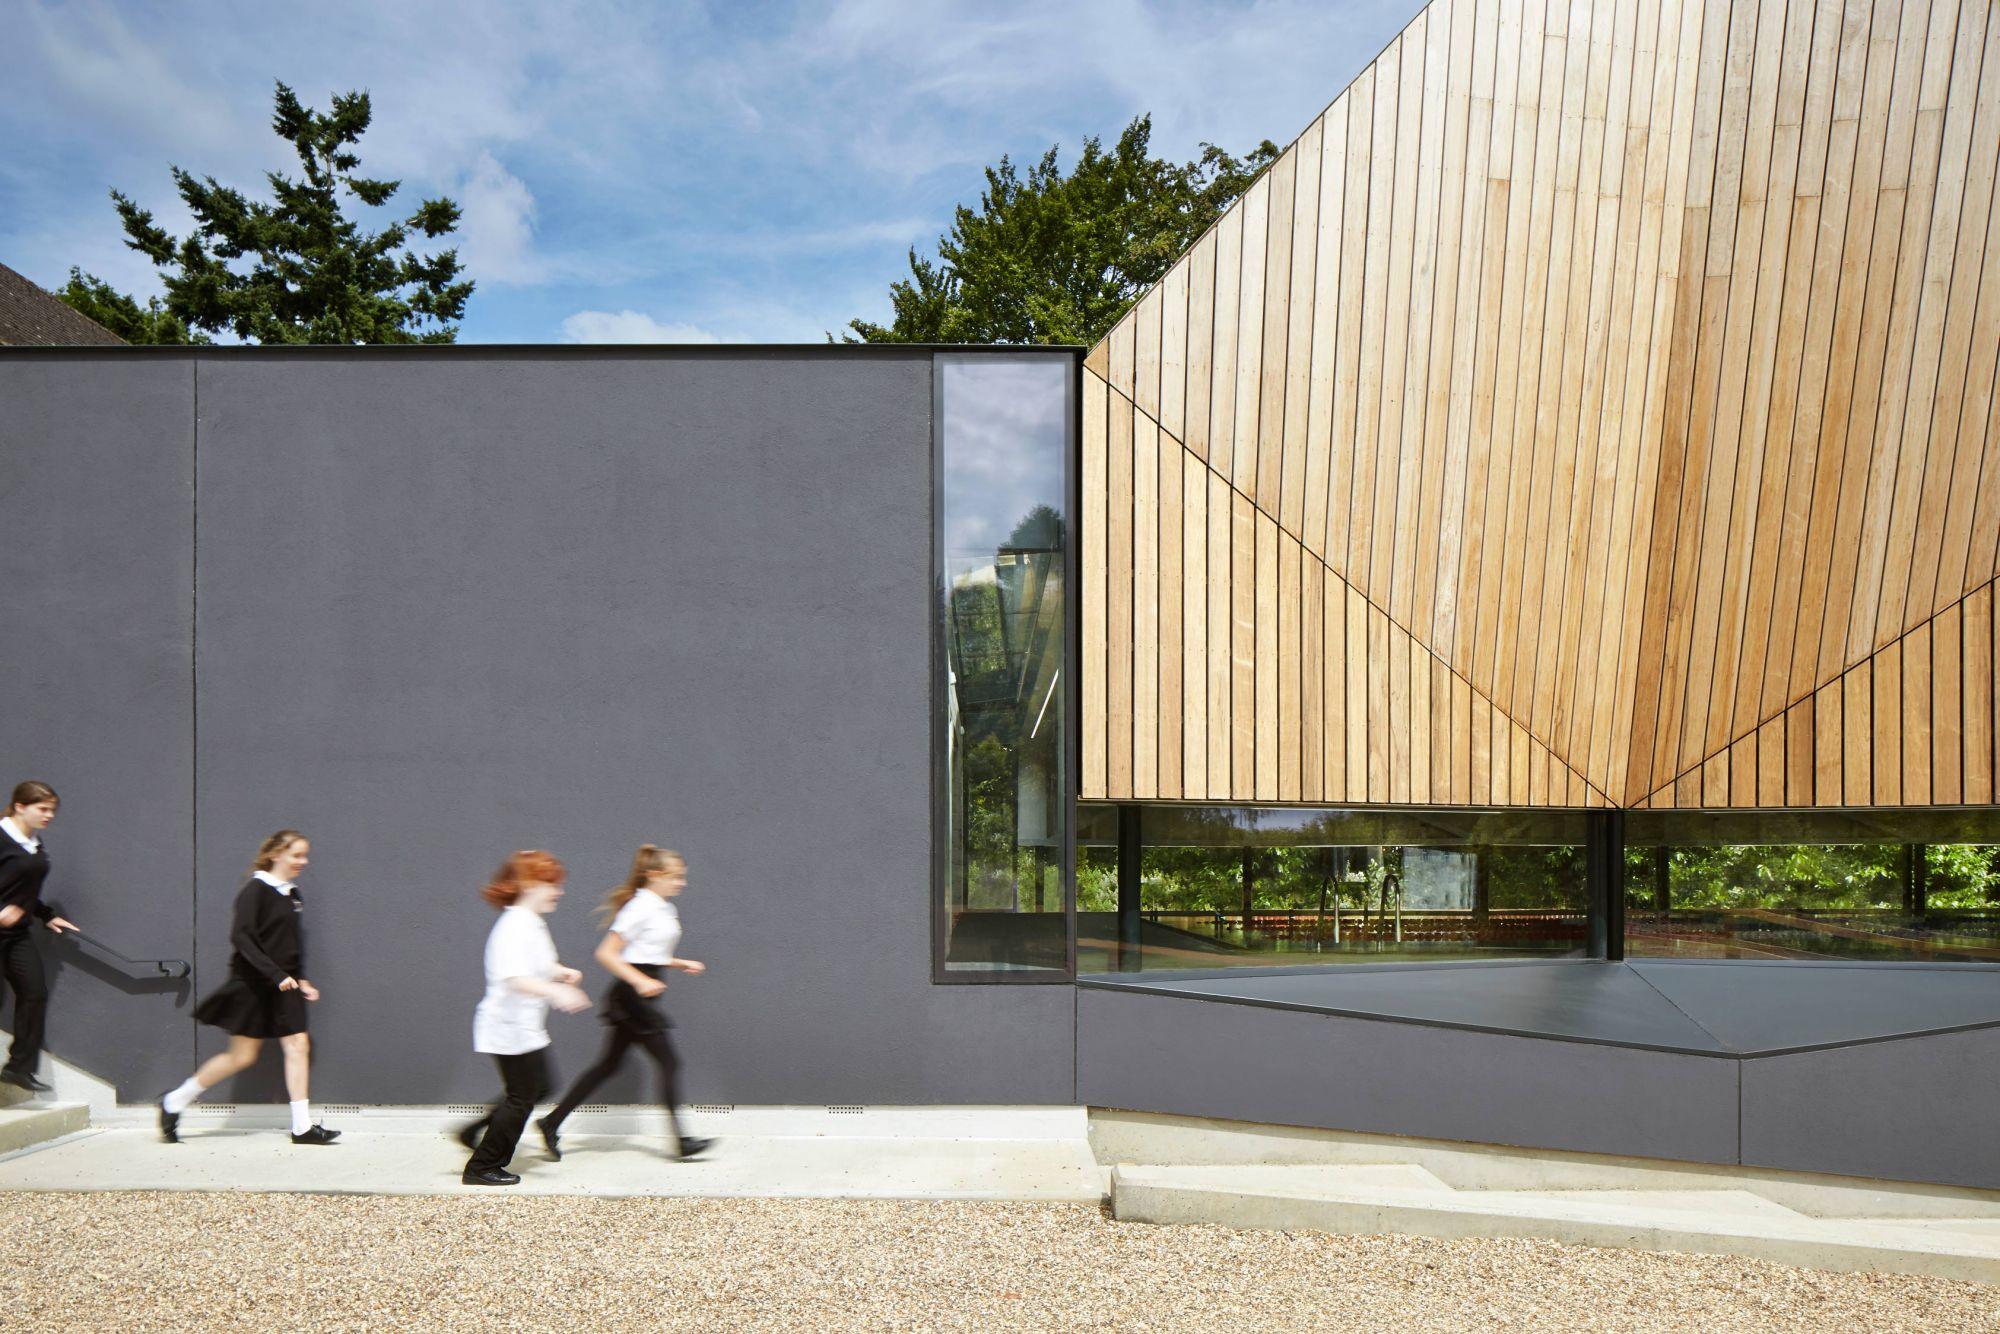 001_Alfriston-School_Duggan-Morris-Architects_Buckinghamshire_004